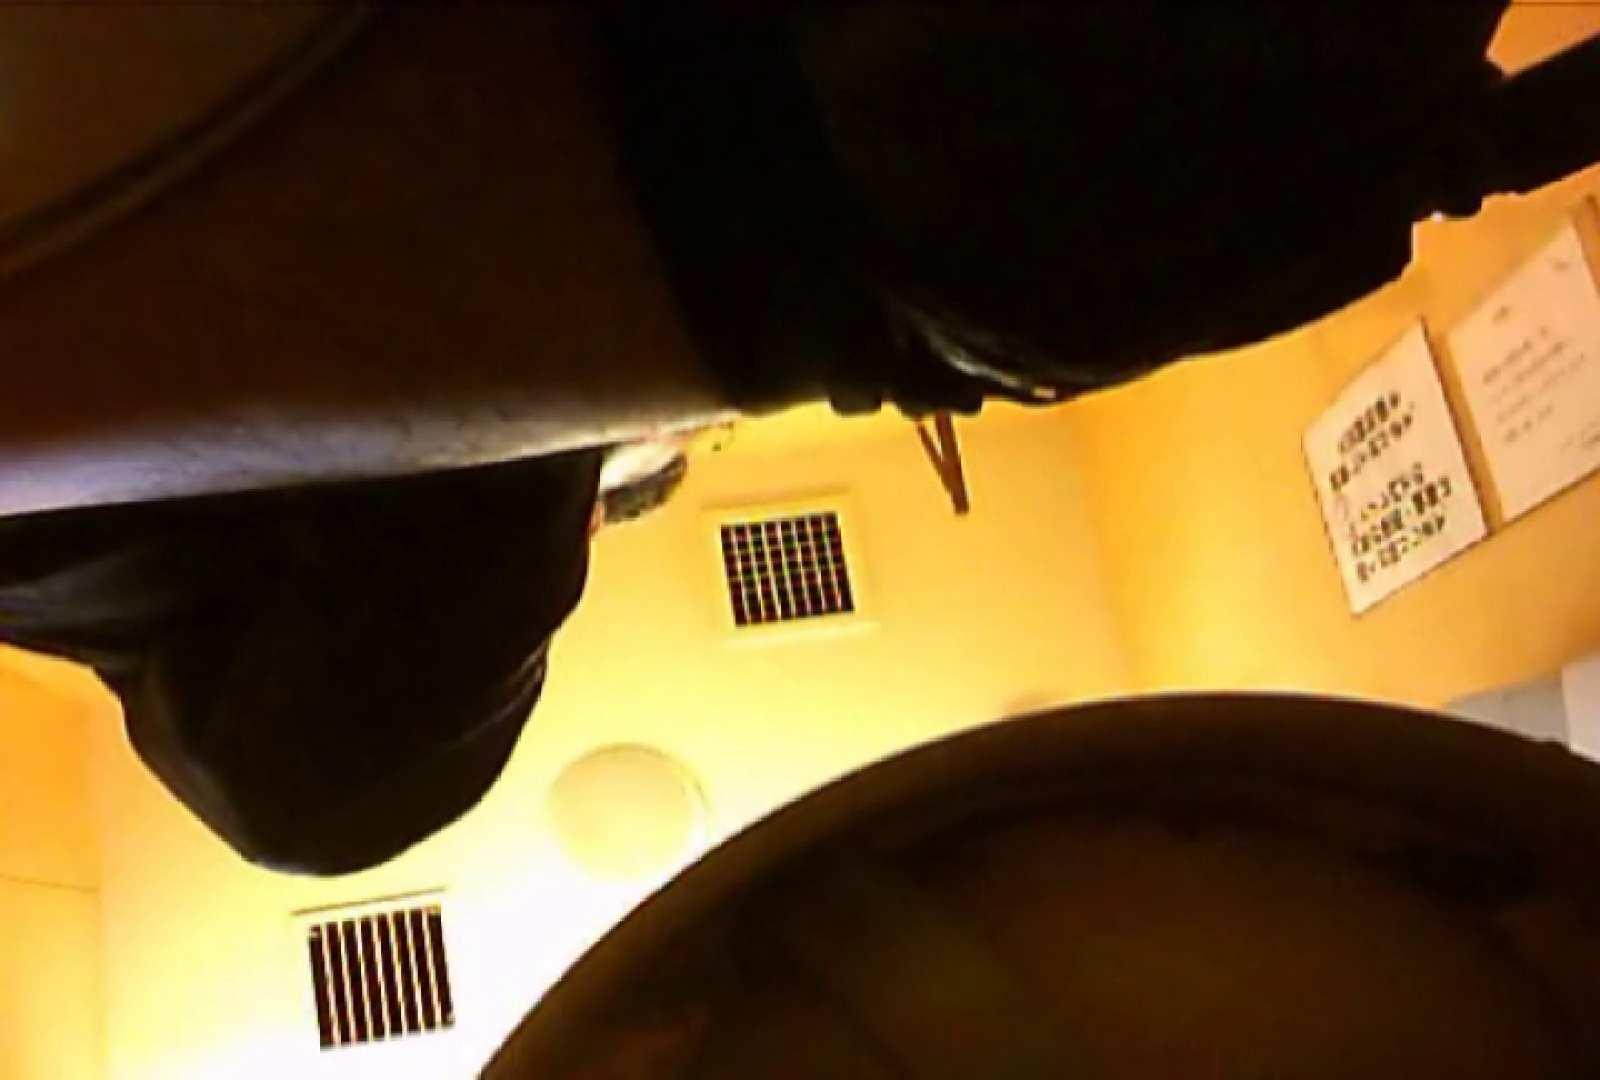 SEASON 2ND!掴み取りさんの洗面所覗き!in新幹線!VOL.02 スーツボーイズ | ノンケボーイズ  82pic 5